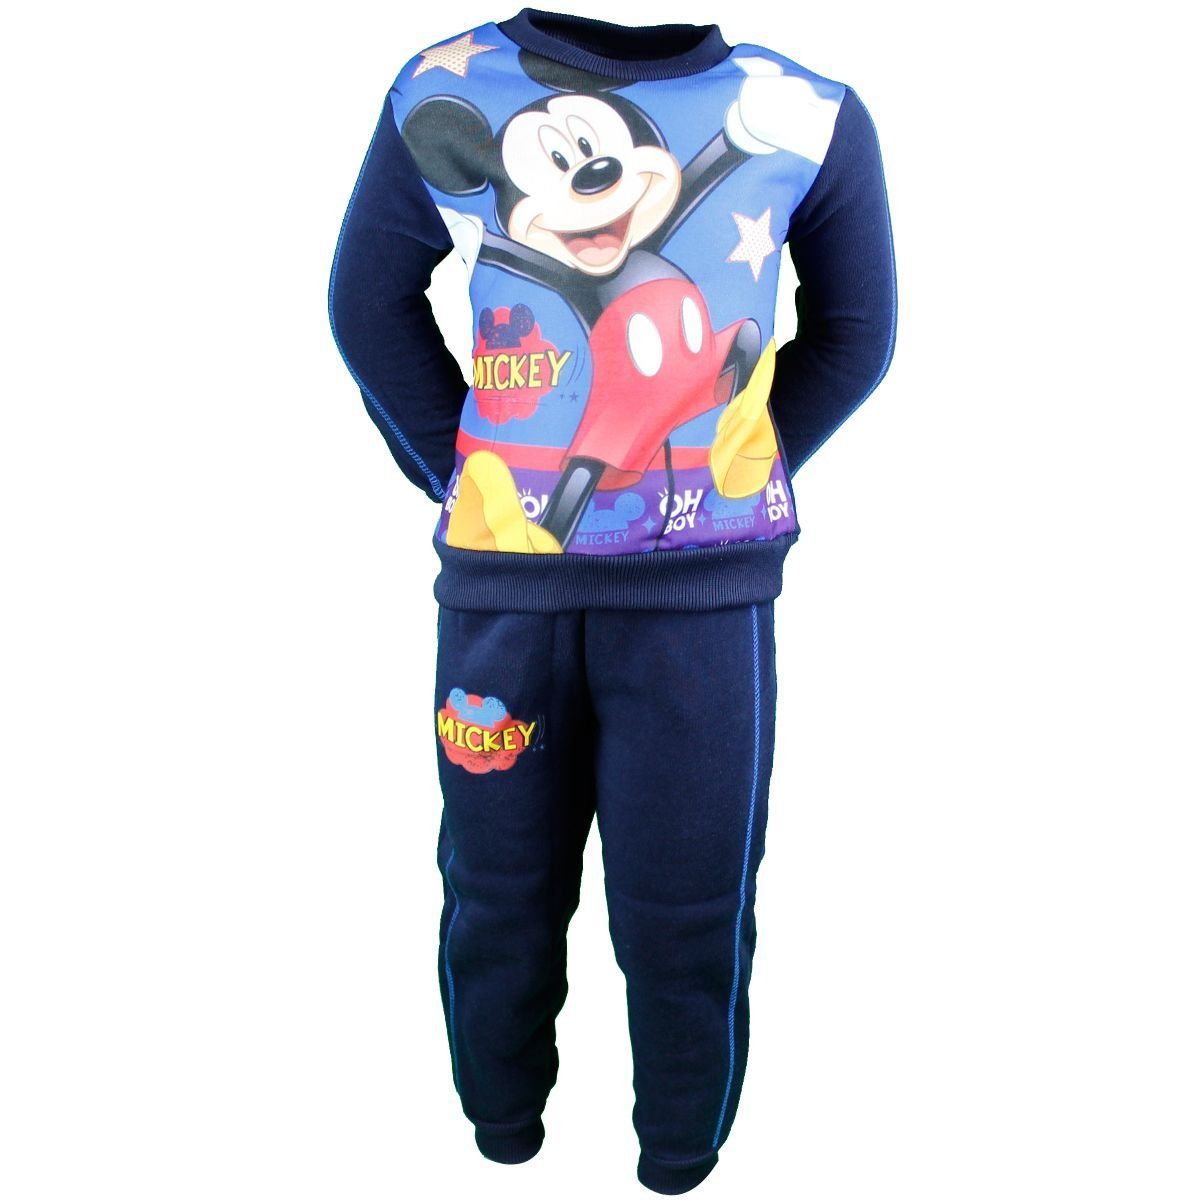 Mickey de manga larga chándal Niño Oh Boy: Amazon.es: Ropa y ...